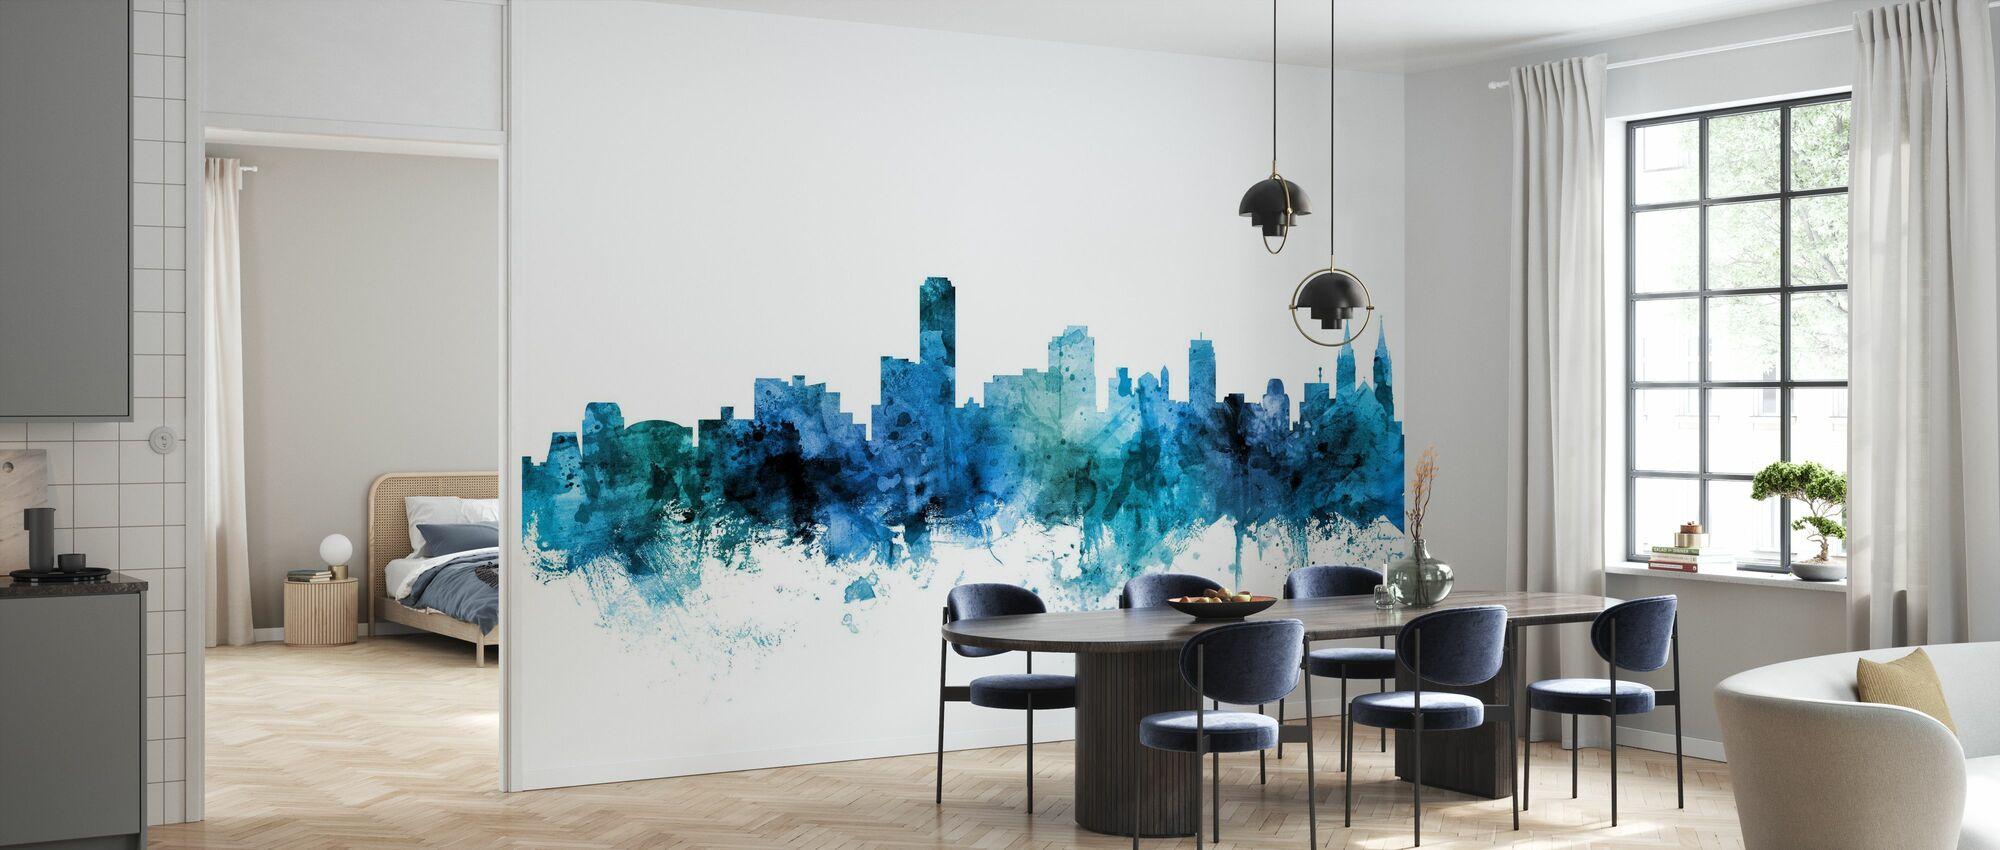 Skyline van Adelaide Australië - Behang - Keuken